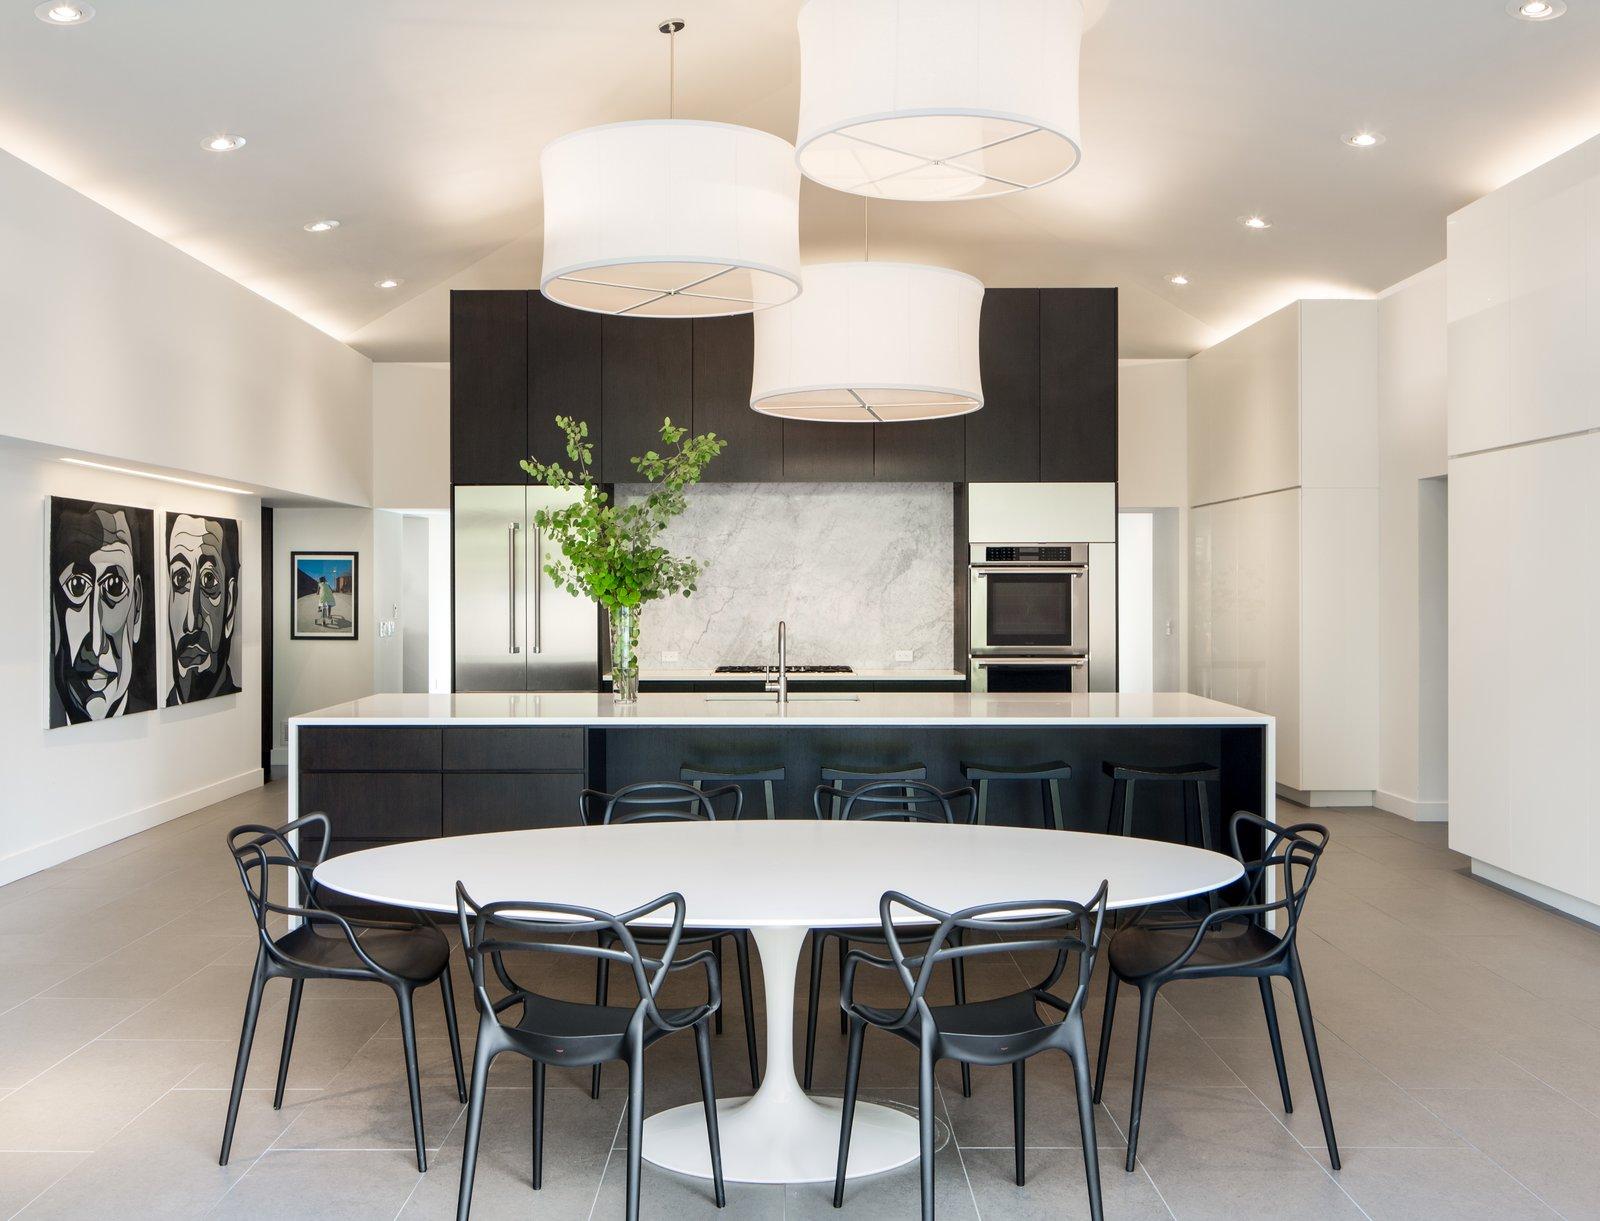 Kitchen and Dining Area  Tagged: Kitchen, Engineered Quartz, Dark Hardwood, Wood, Stone Slab, Pendant, Wall Oven, Refrigerator, and Undermount.  Best Kitchen Wall Oven Dark Hardwood Photos from Donner Residence